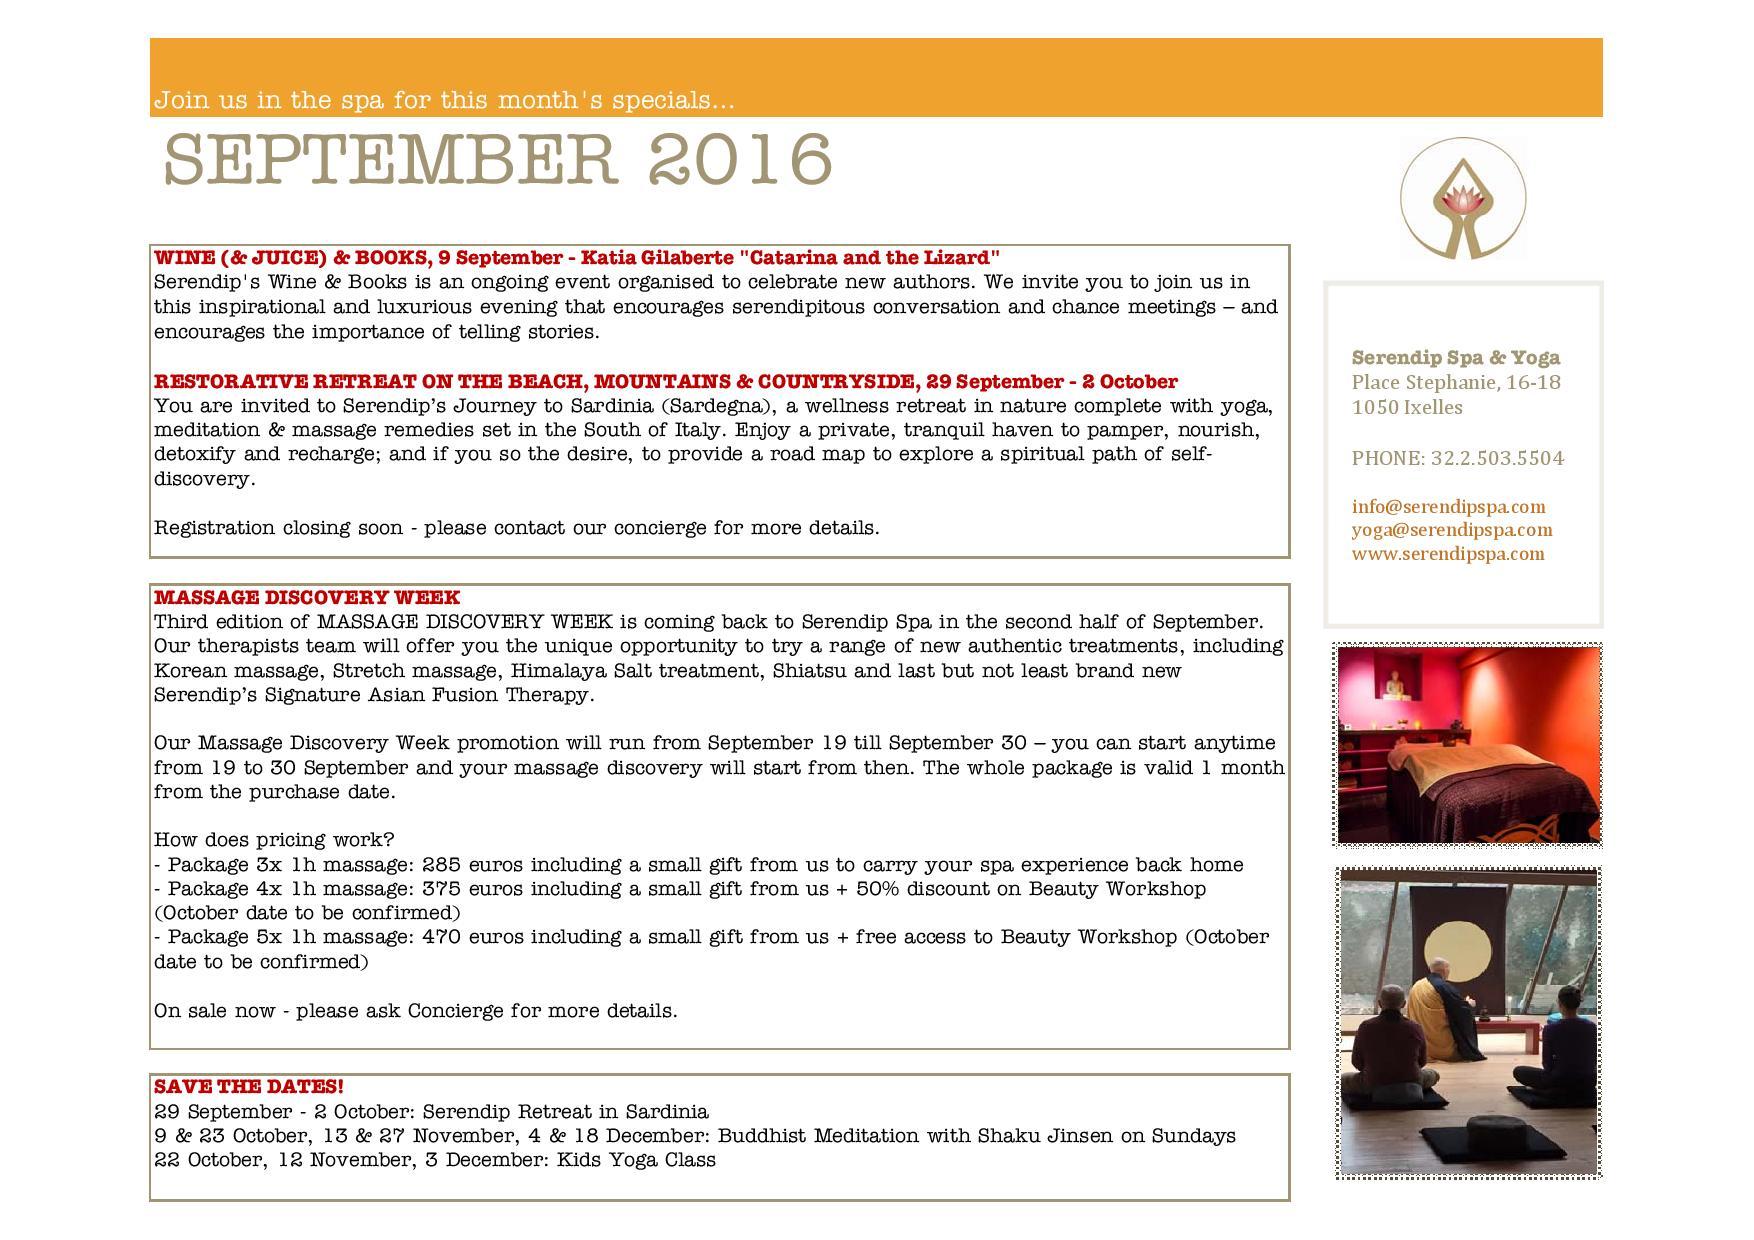 Serendip Spa and Yoga Calendar 2016_September_BACK A4-page-001.jpg